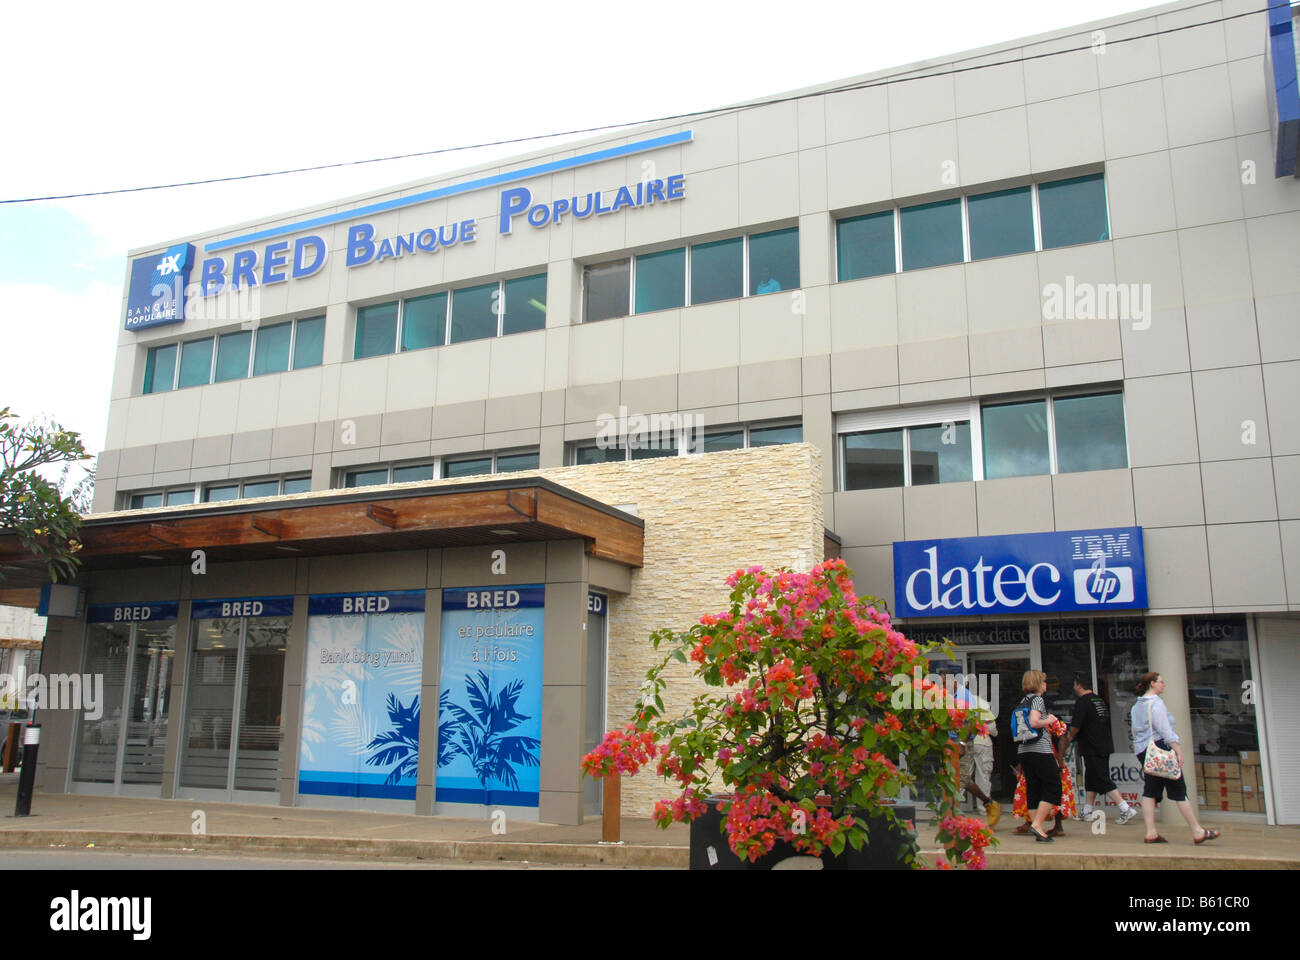 Bred Banque Populaire Bank, Port Vila, Efate island, Vanuatu - Stock Image